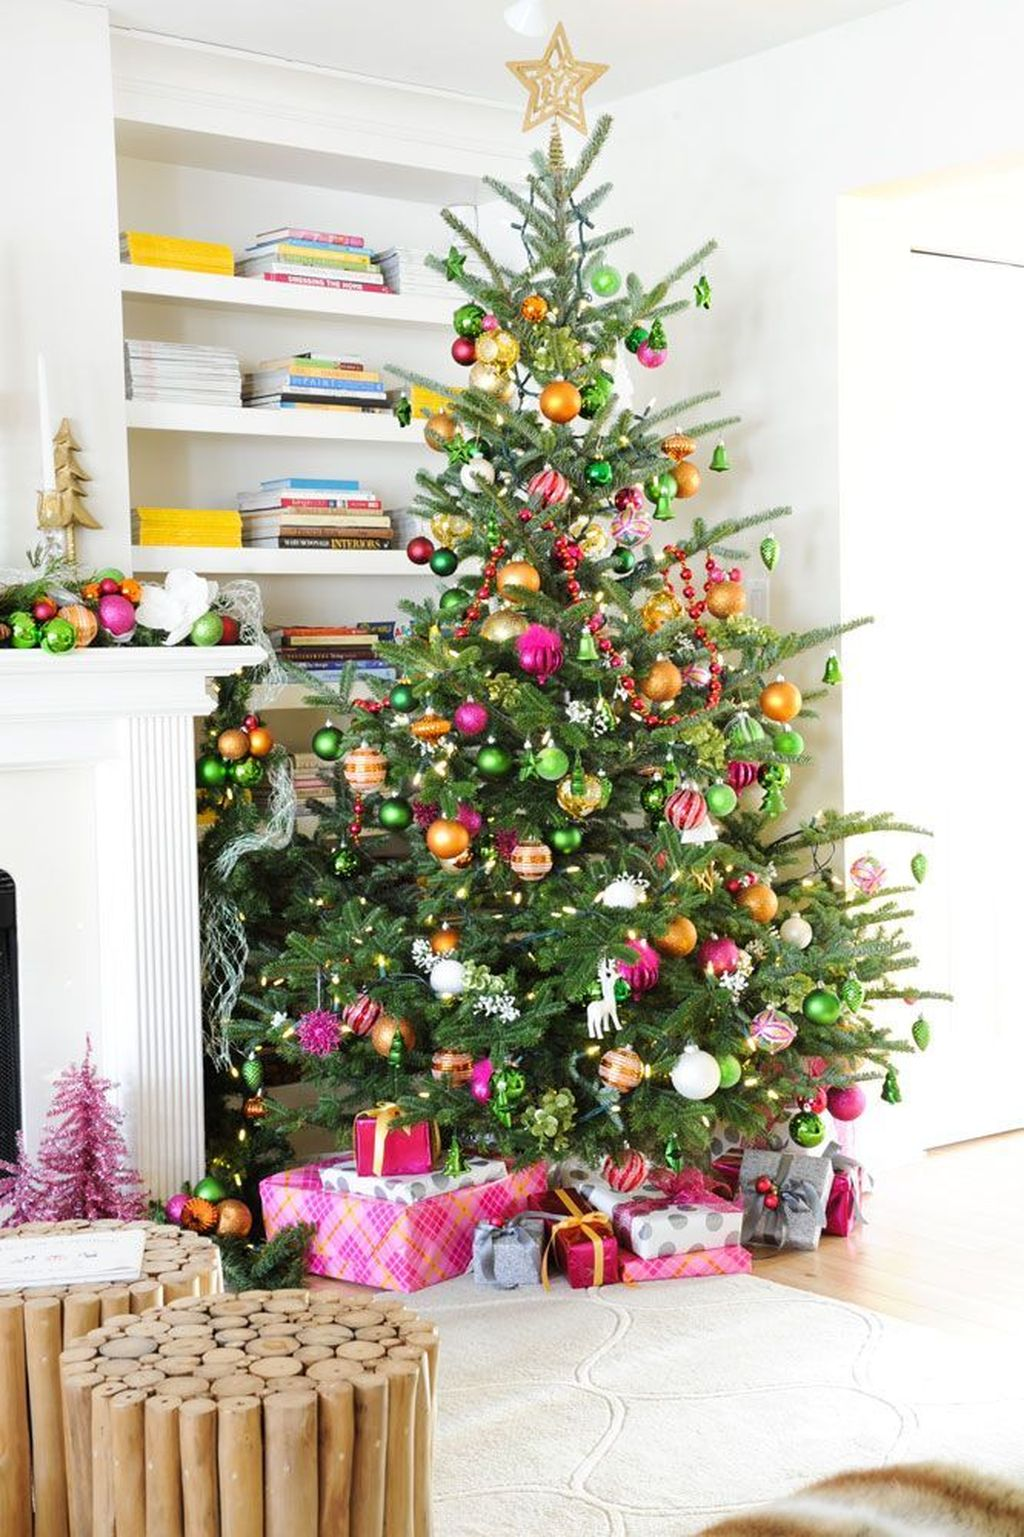 Amazing Winter Christmas Tree Design And Decor Ideas 16